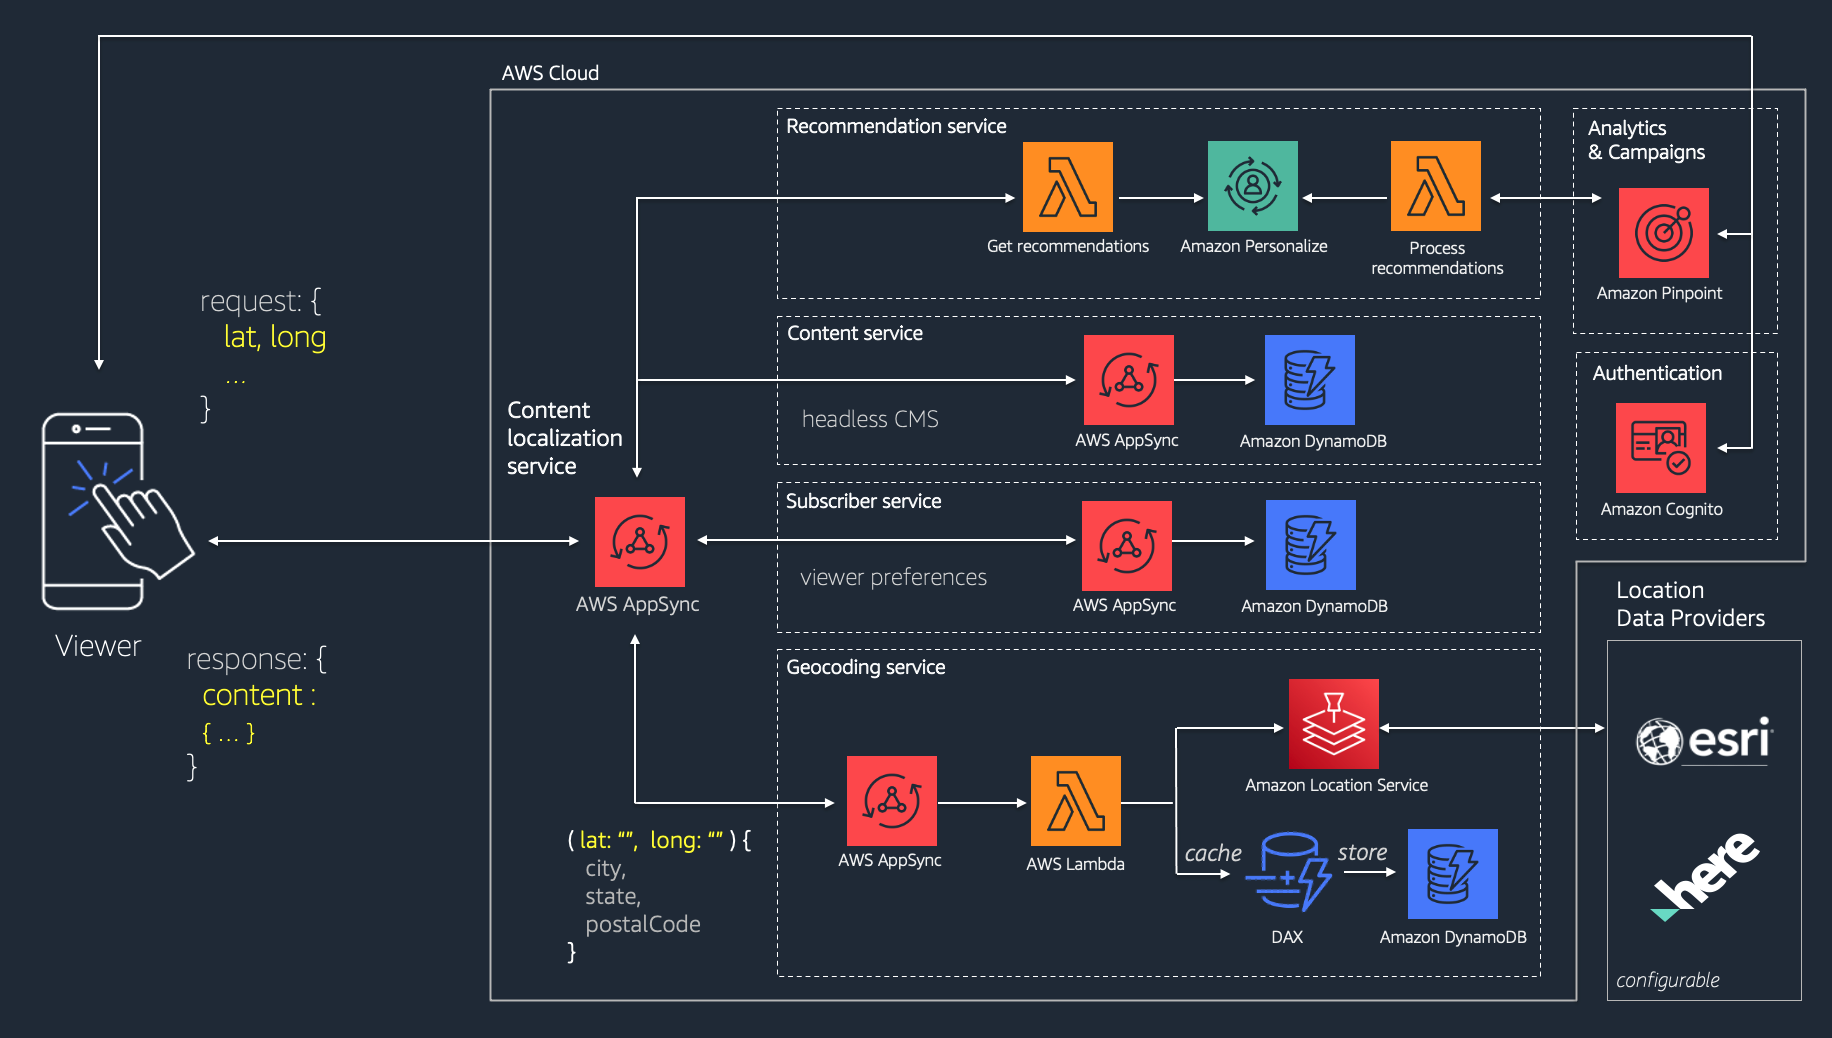 AWS edge localization capabilities